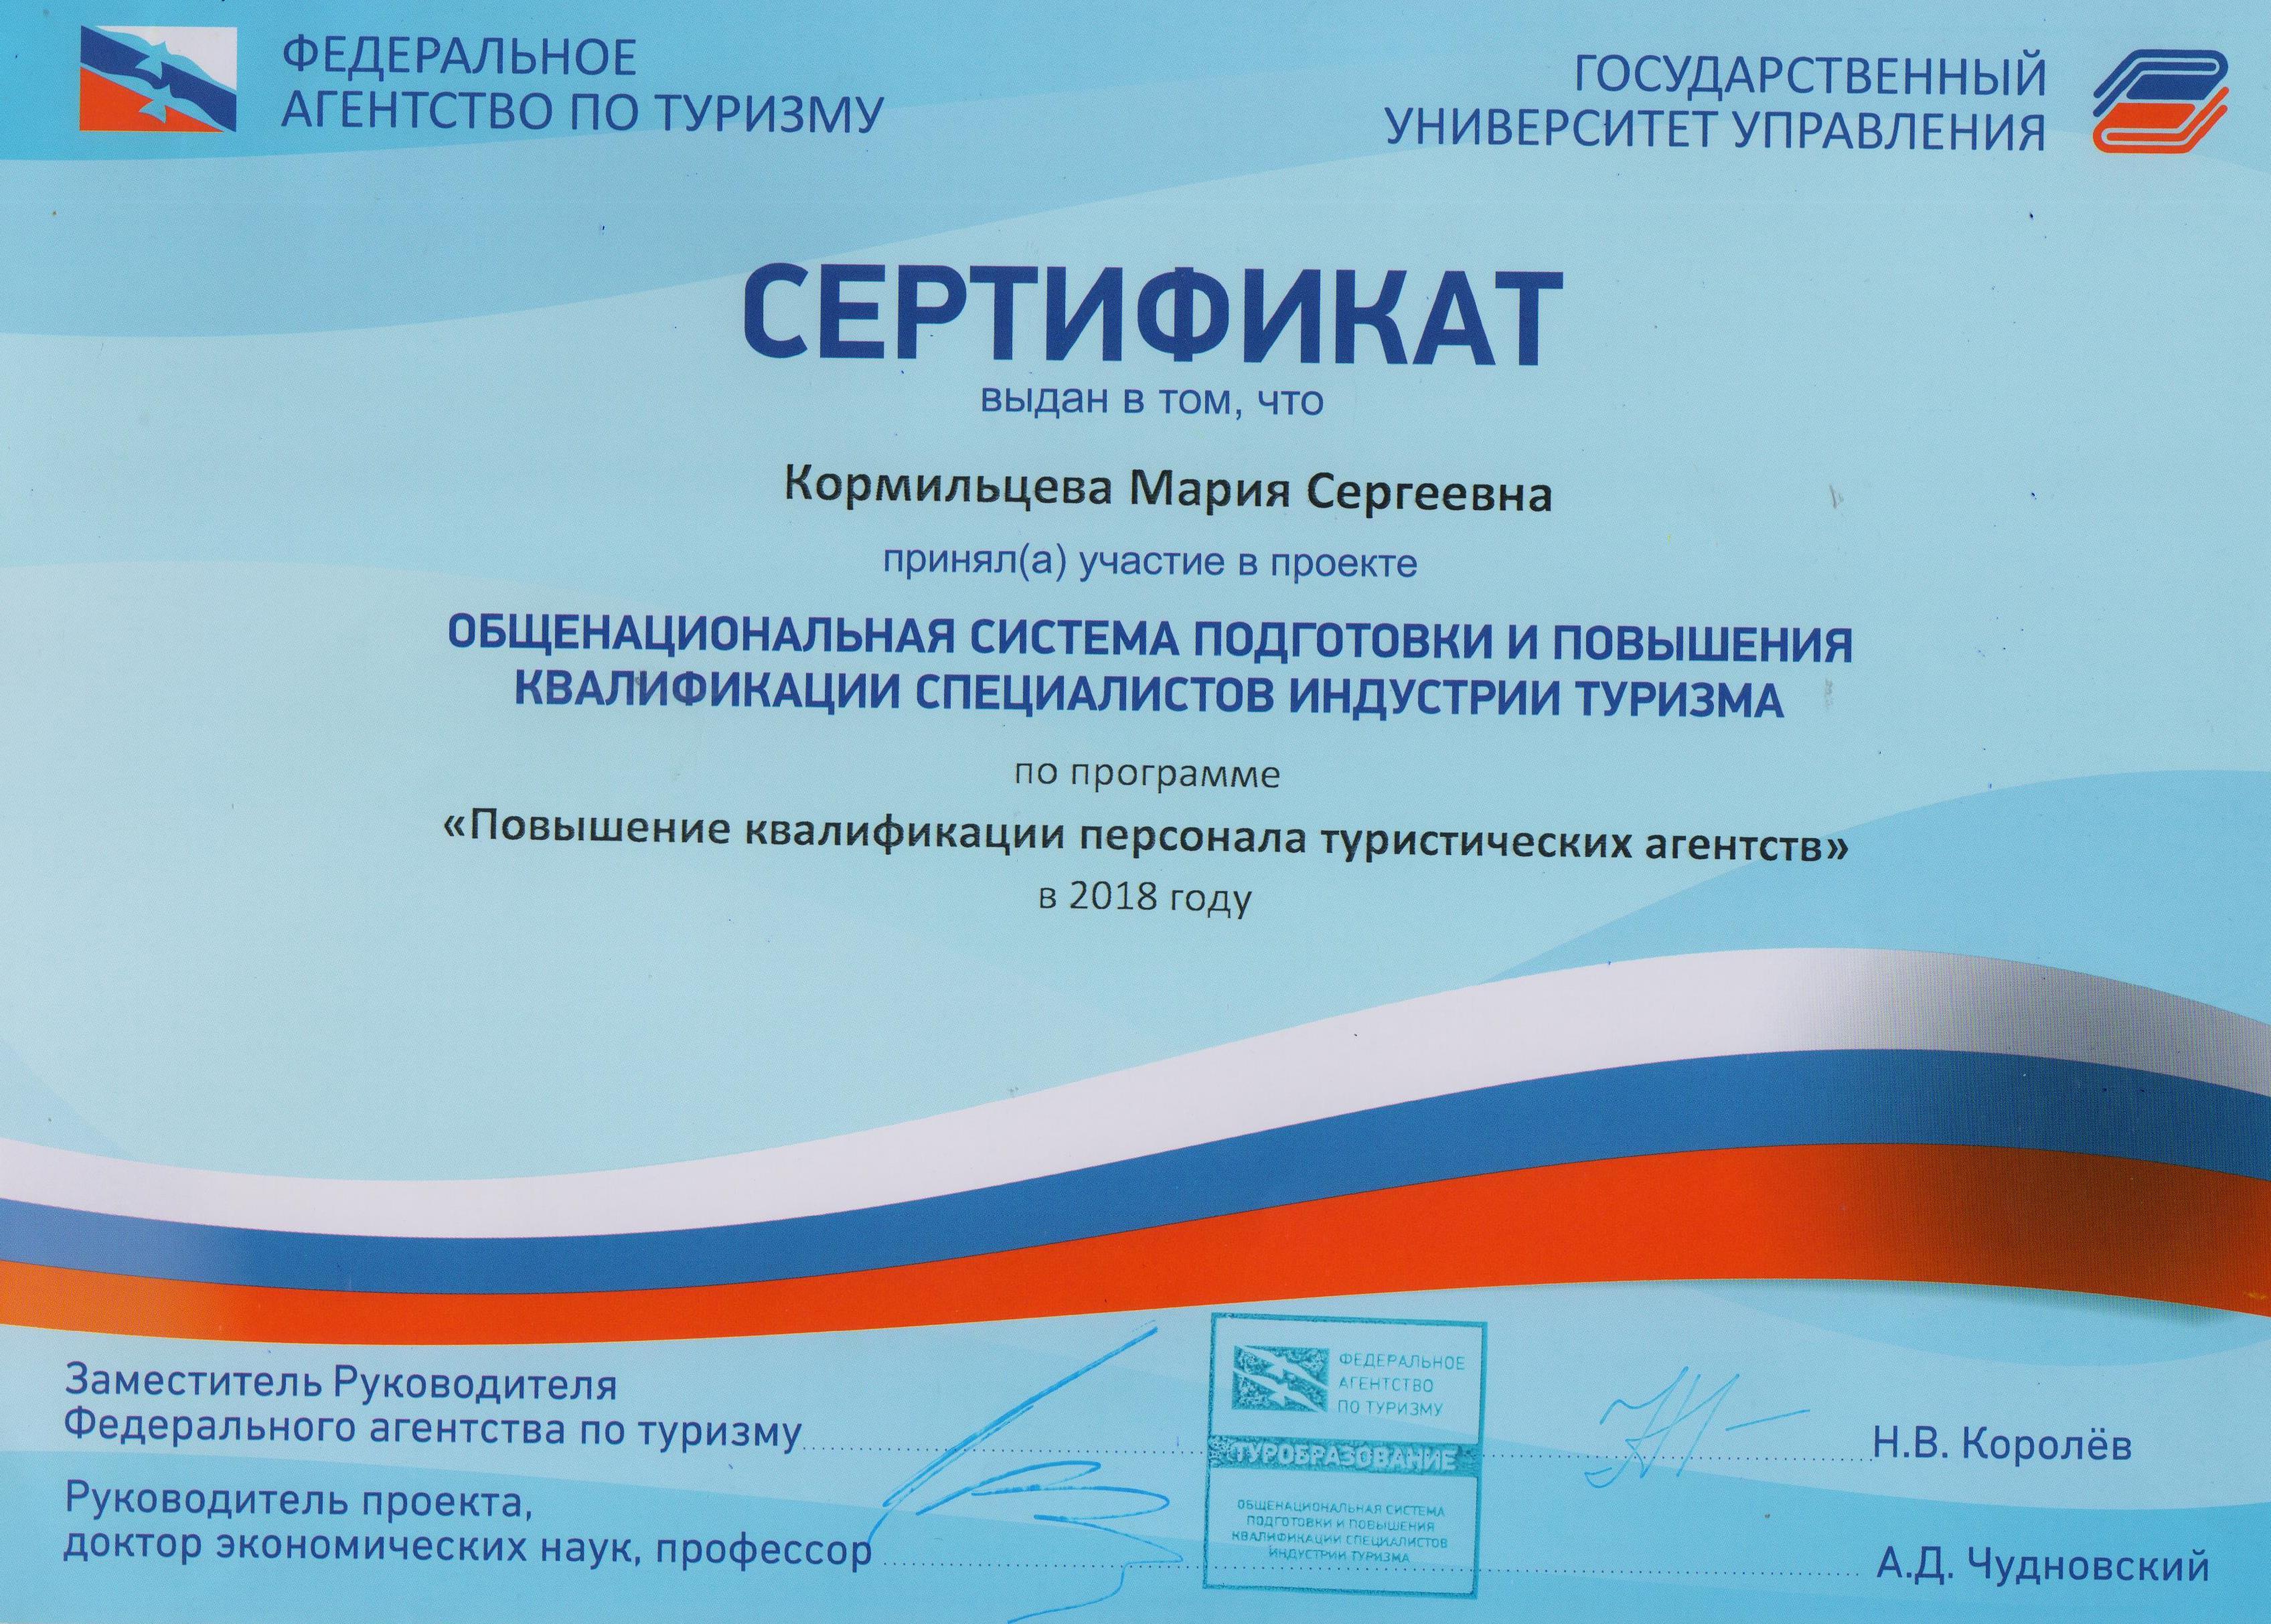 Сертификат Комильцева М.С 001.jpg